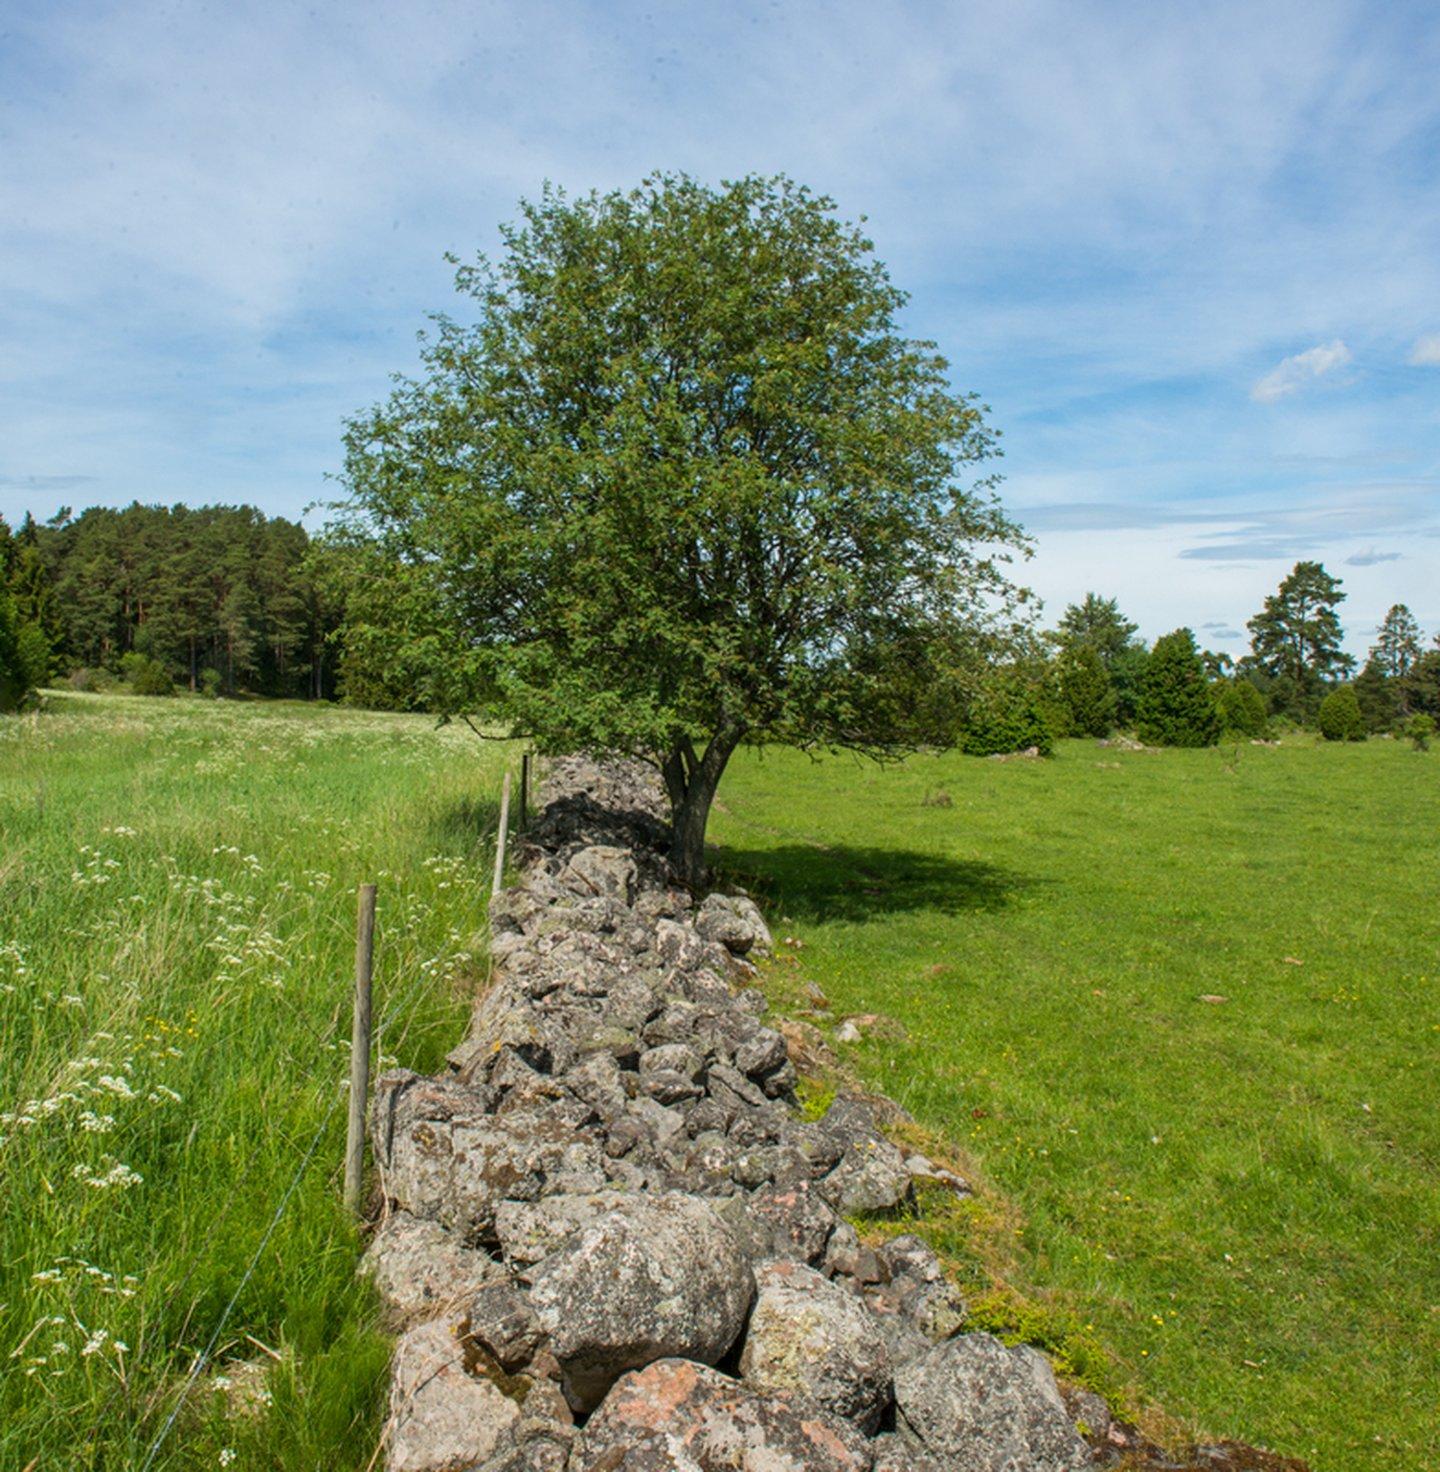 Grazed and ungrazed land in the Swedish farmland, Sweden.